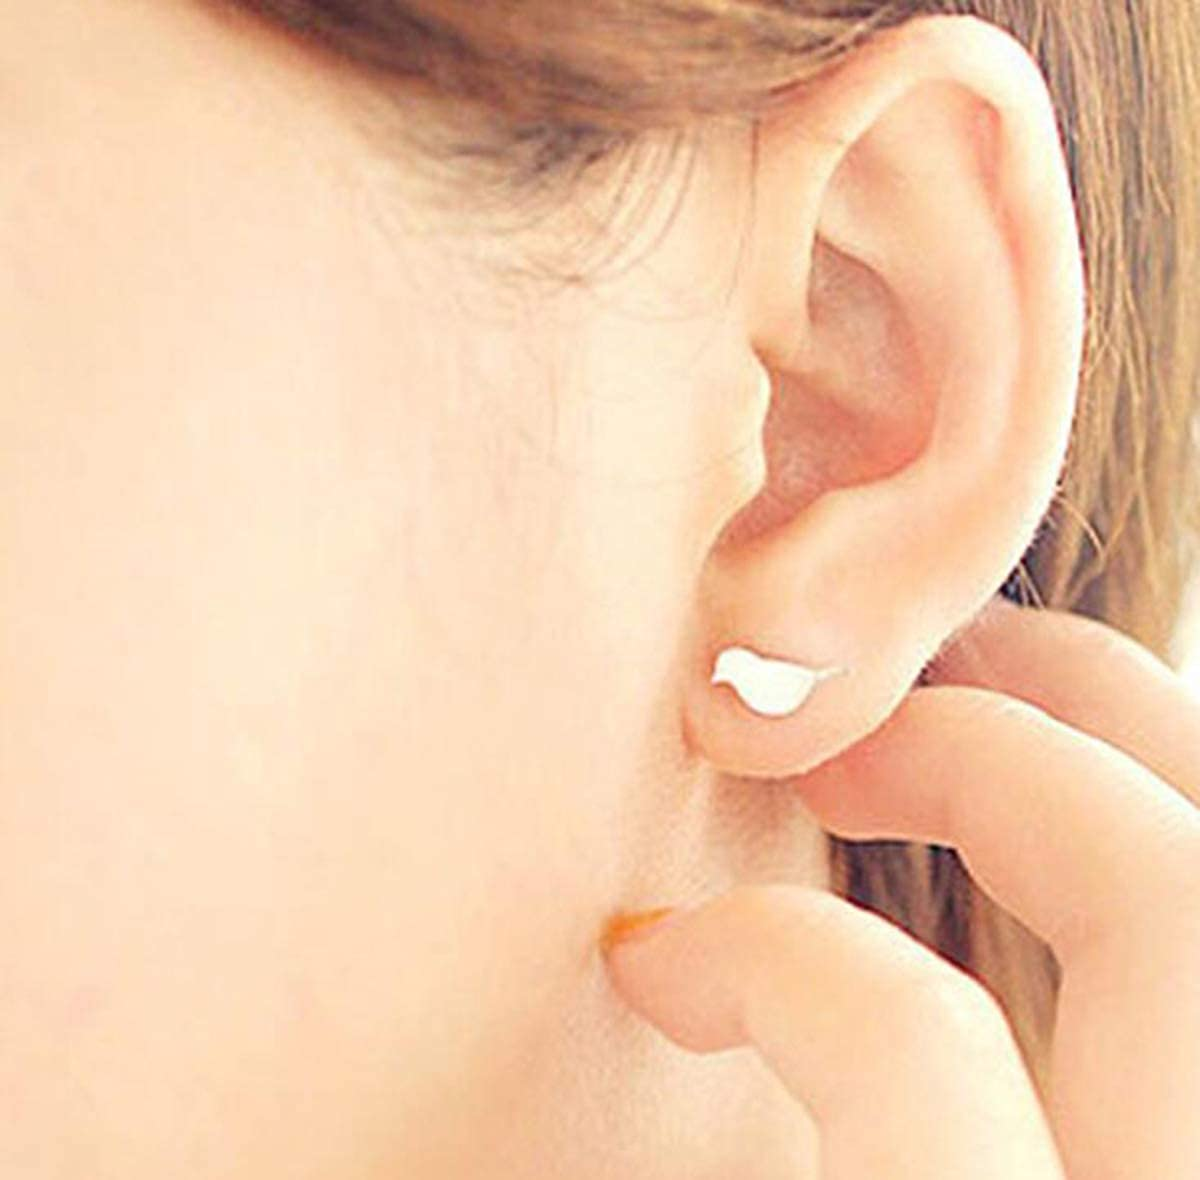 Silver Hugdong Dull Polish Bird Stud Earrings with Jewelry Box,Bird Earrings for Women